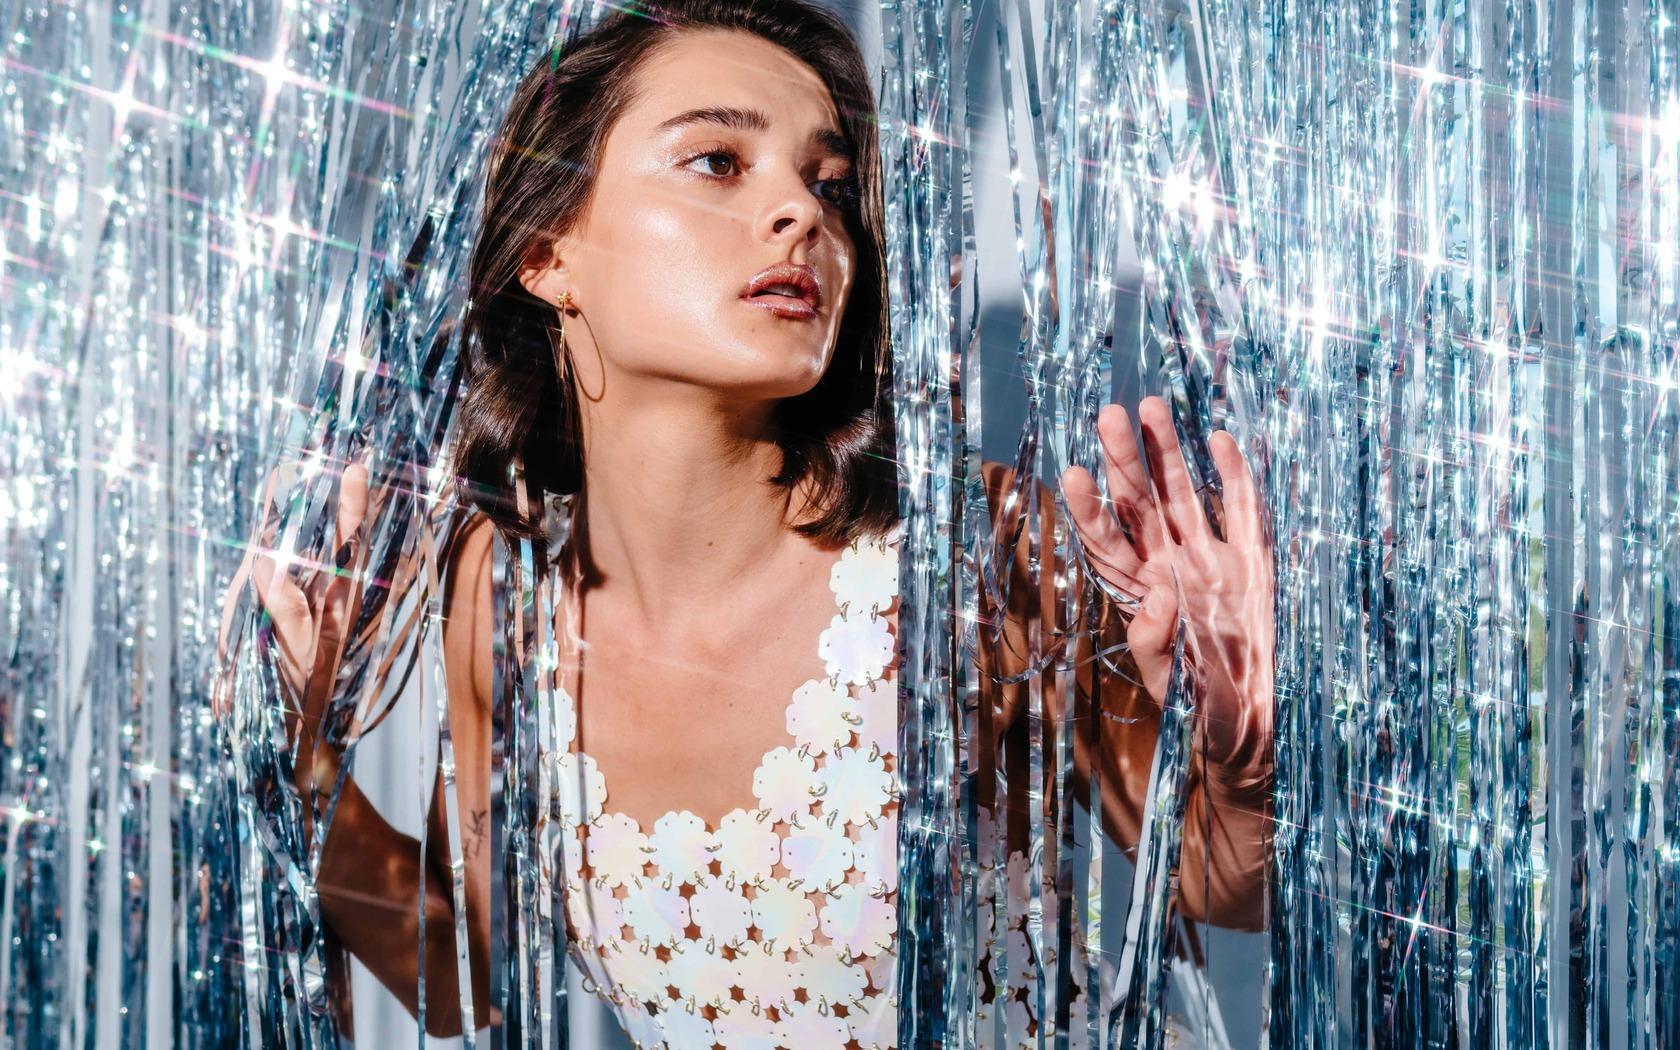 charlotte-lawrence-derrick-freske-photoshoot-for-euphoria-magazine-ri.jpg